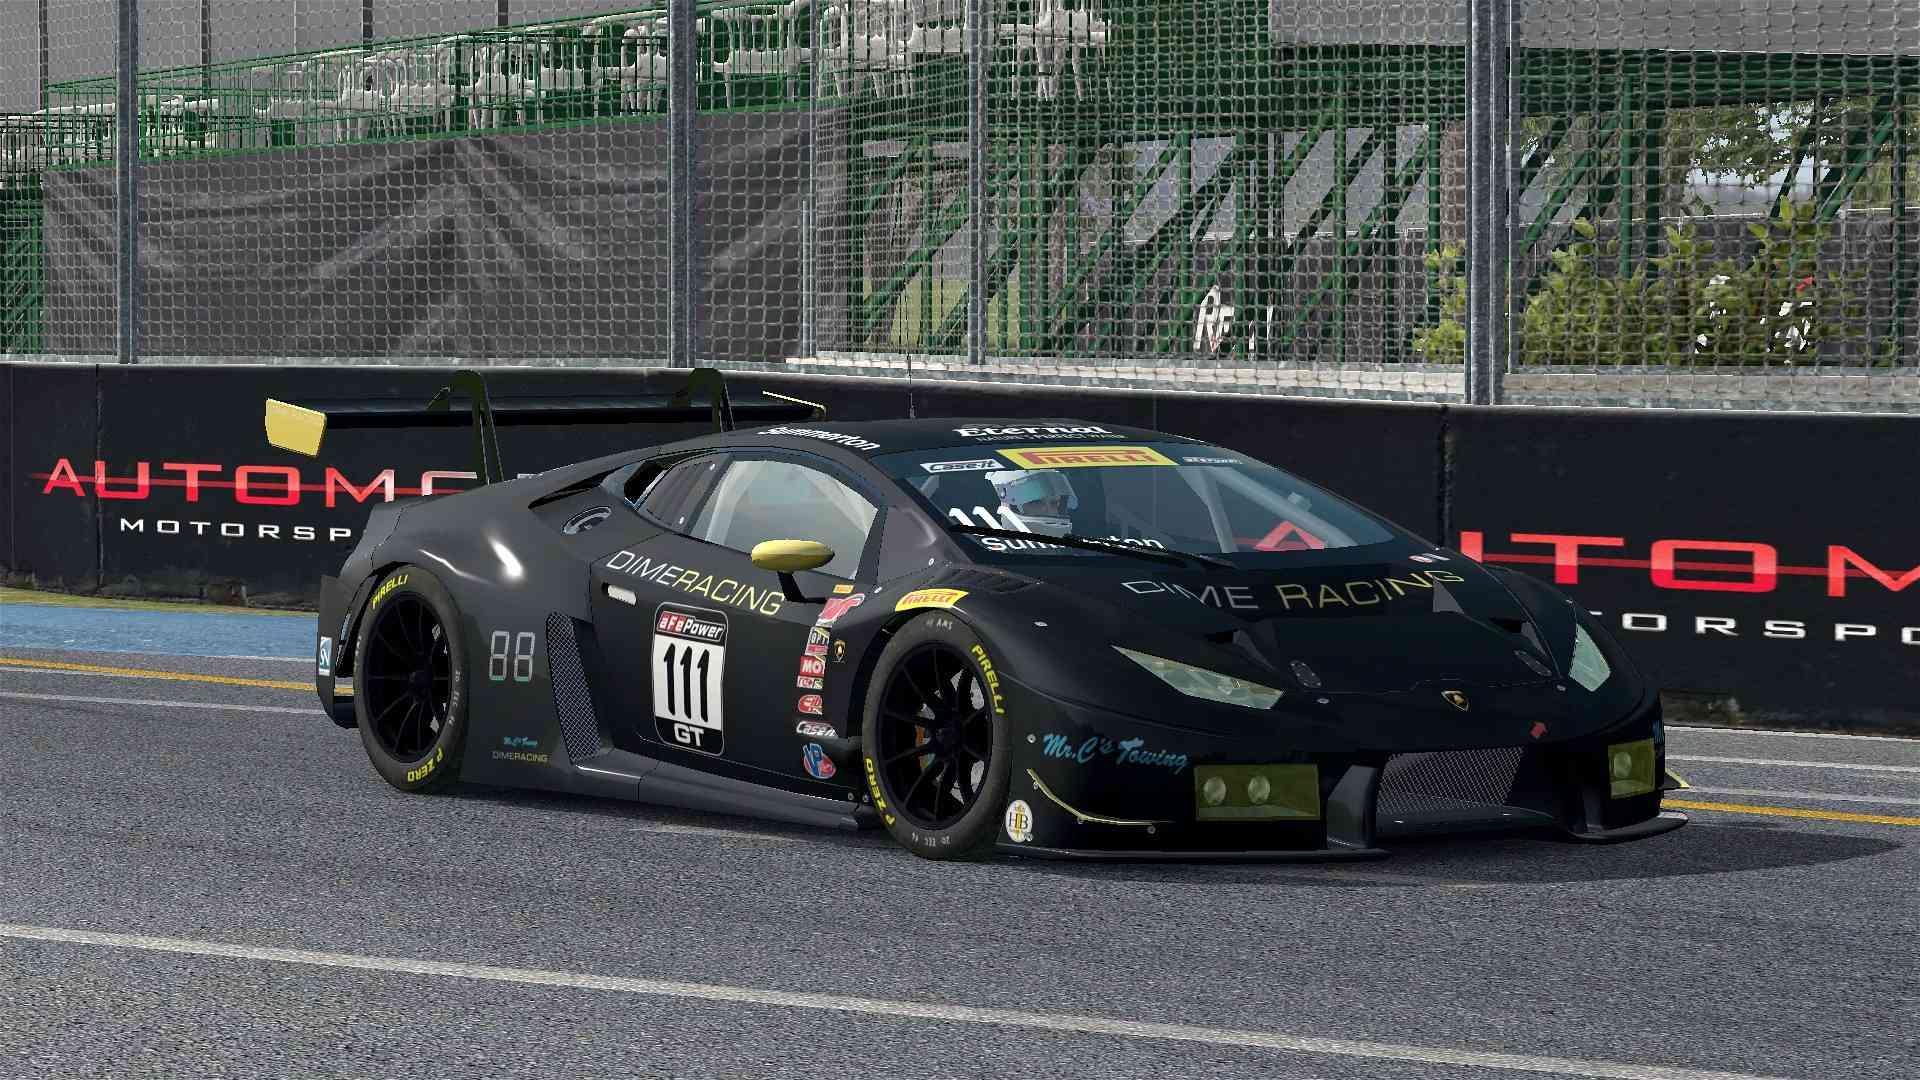 AMS Pirelli World Challenge 2017 v0.6 - Released 20170414